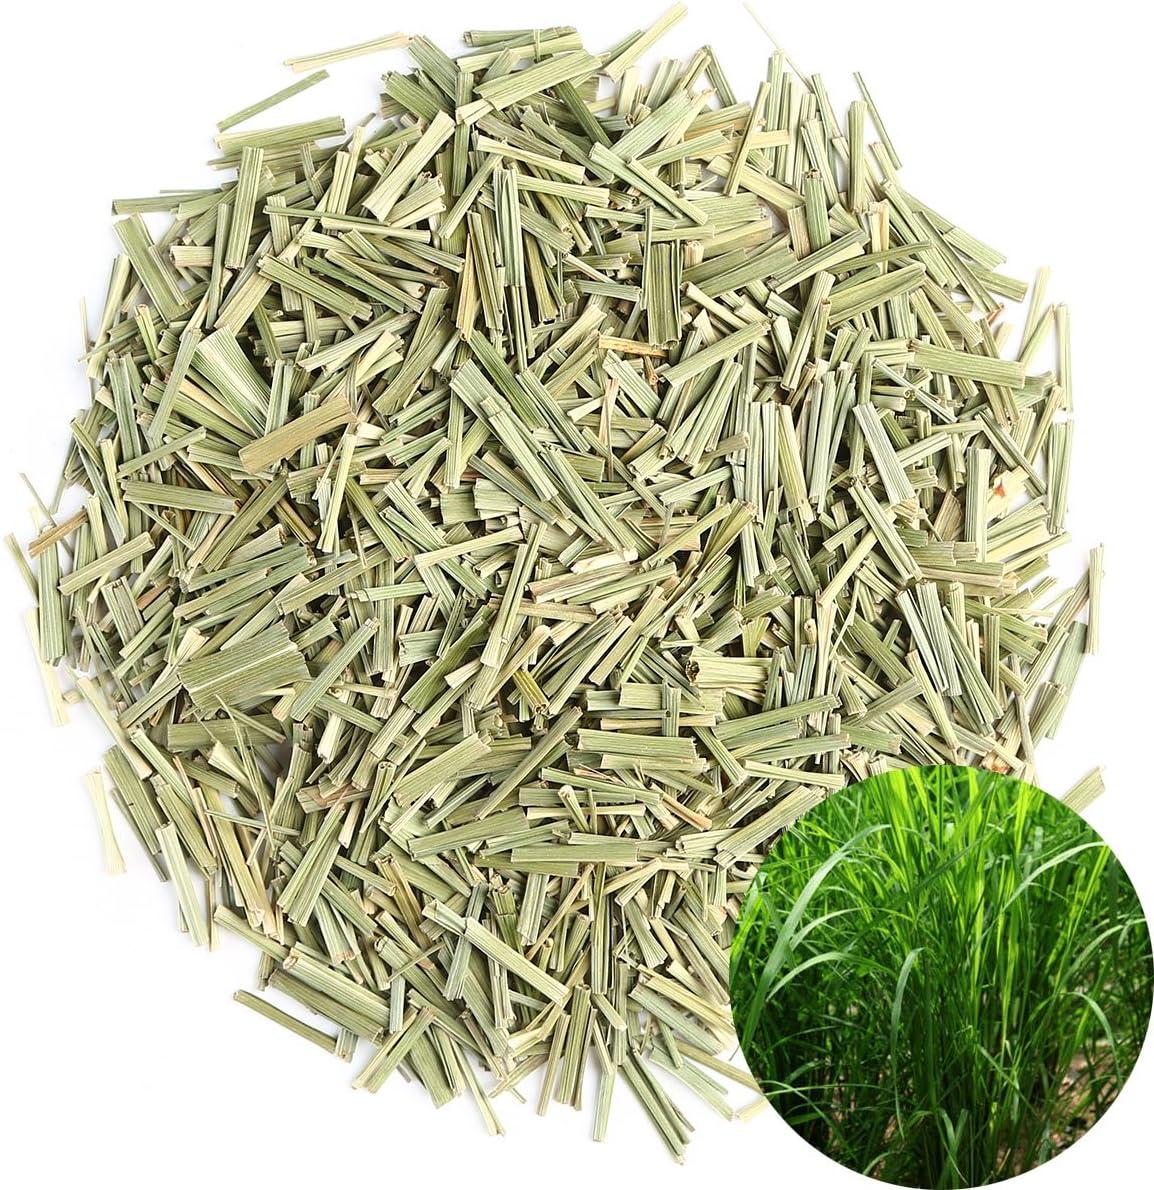 TooGet Wild Vanilla Dried Lemongrass Cut Großhandel, Natürliches Zitronengras Duftendes Kraut, Top Grade - 115g